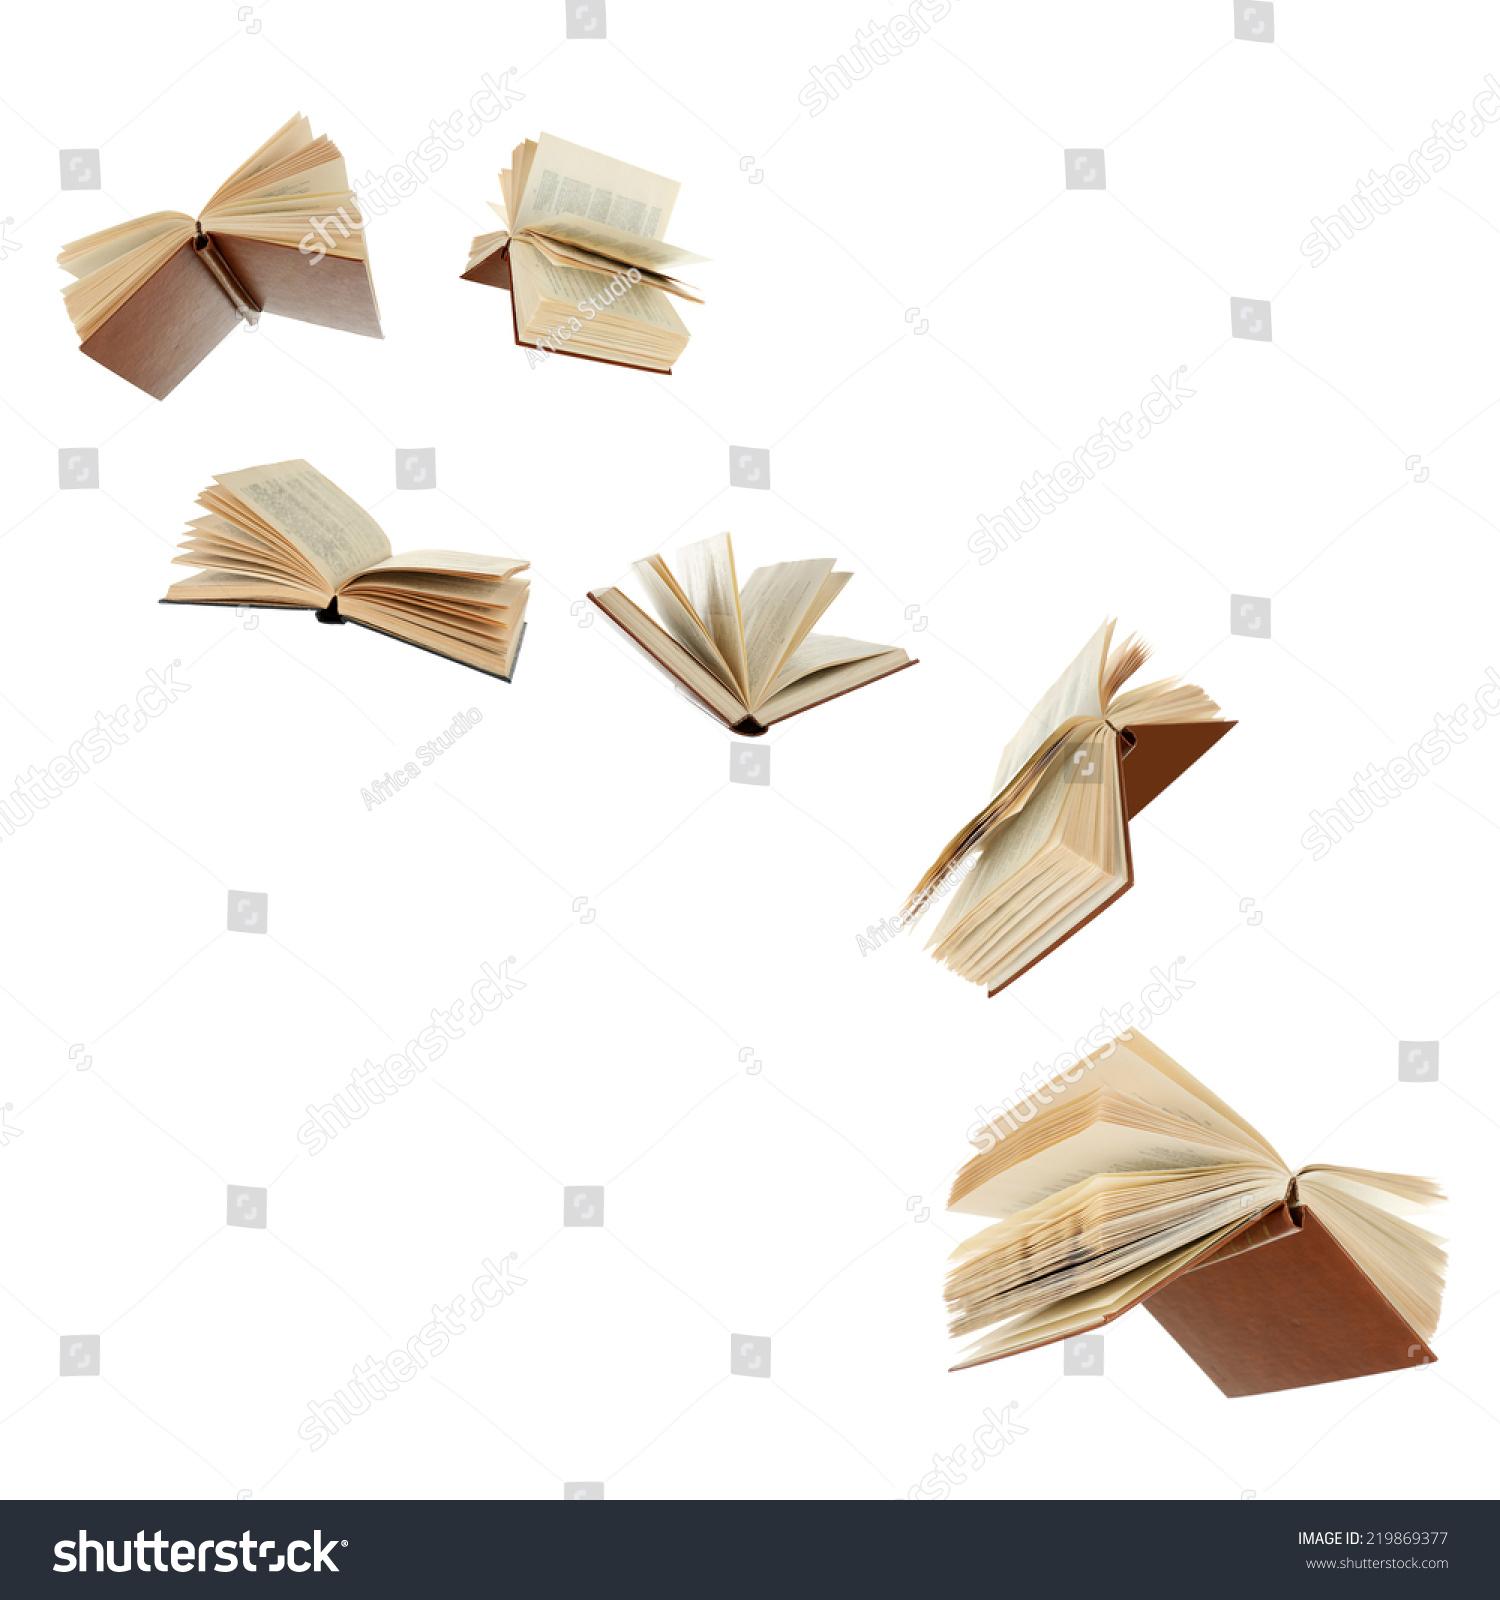 Flying Books Isolated On White Stock Photo 219869377 - Shutterstock